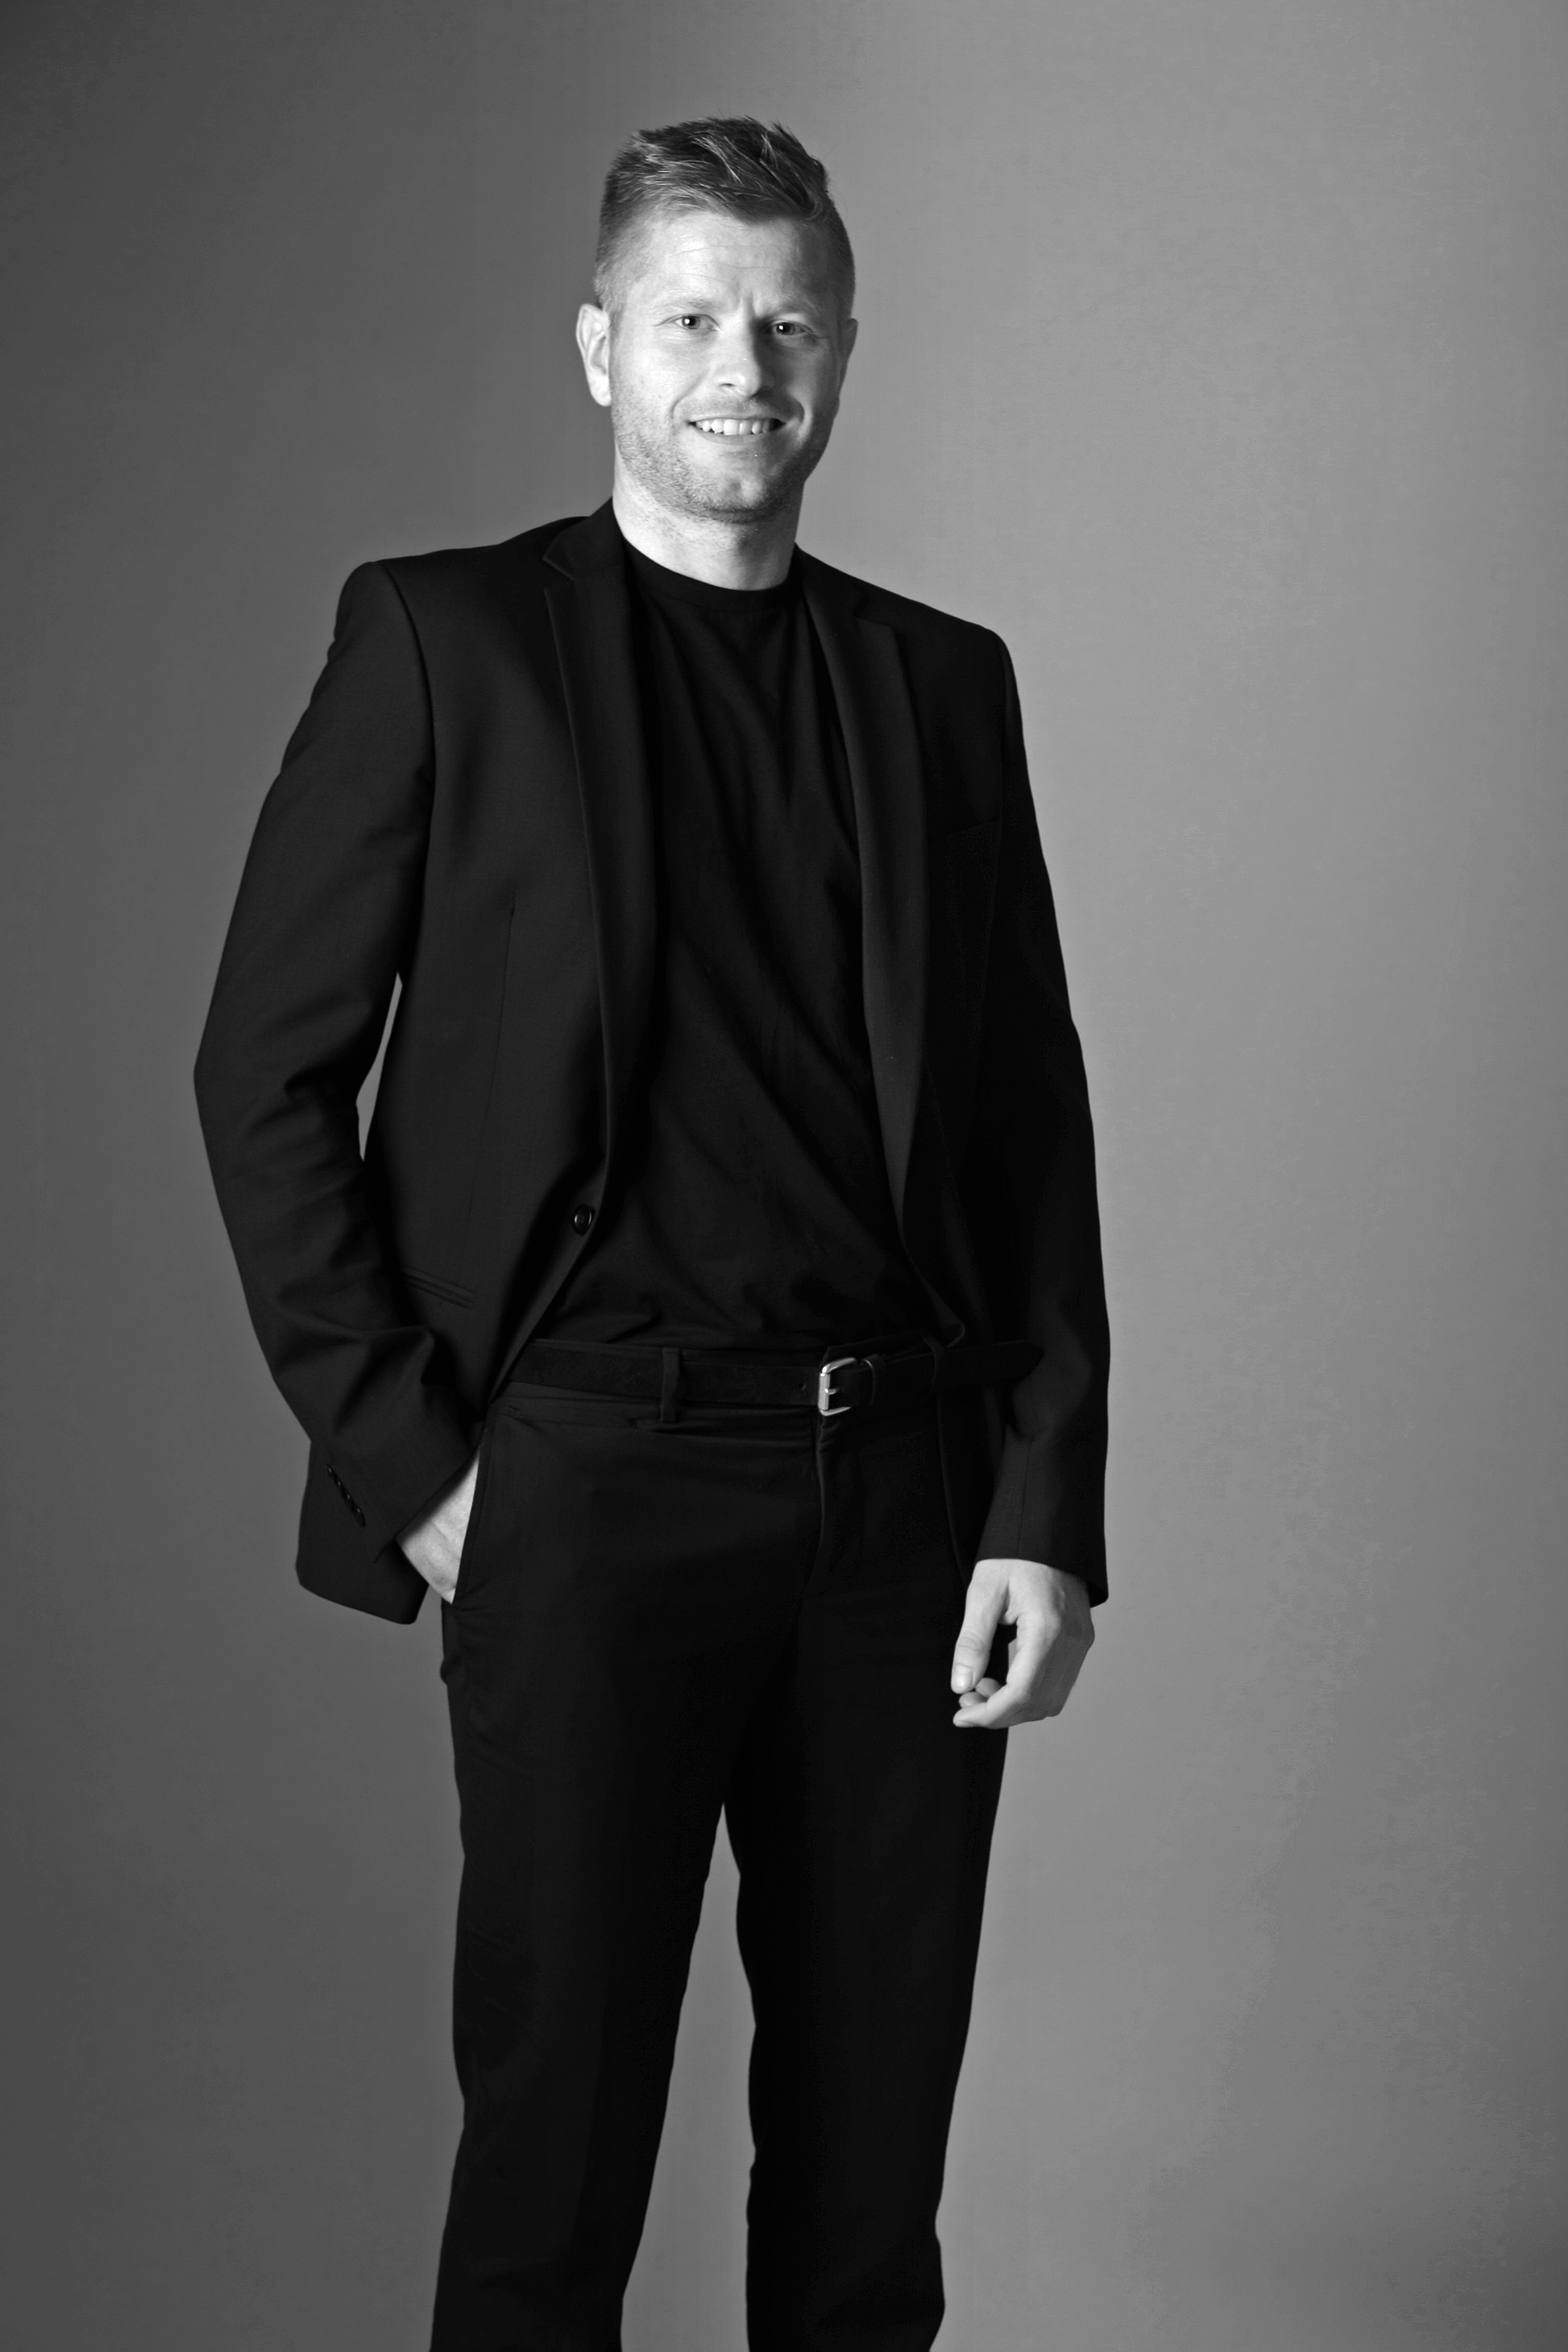 Anders Kynde Bach